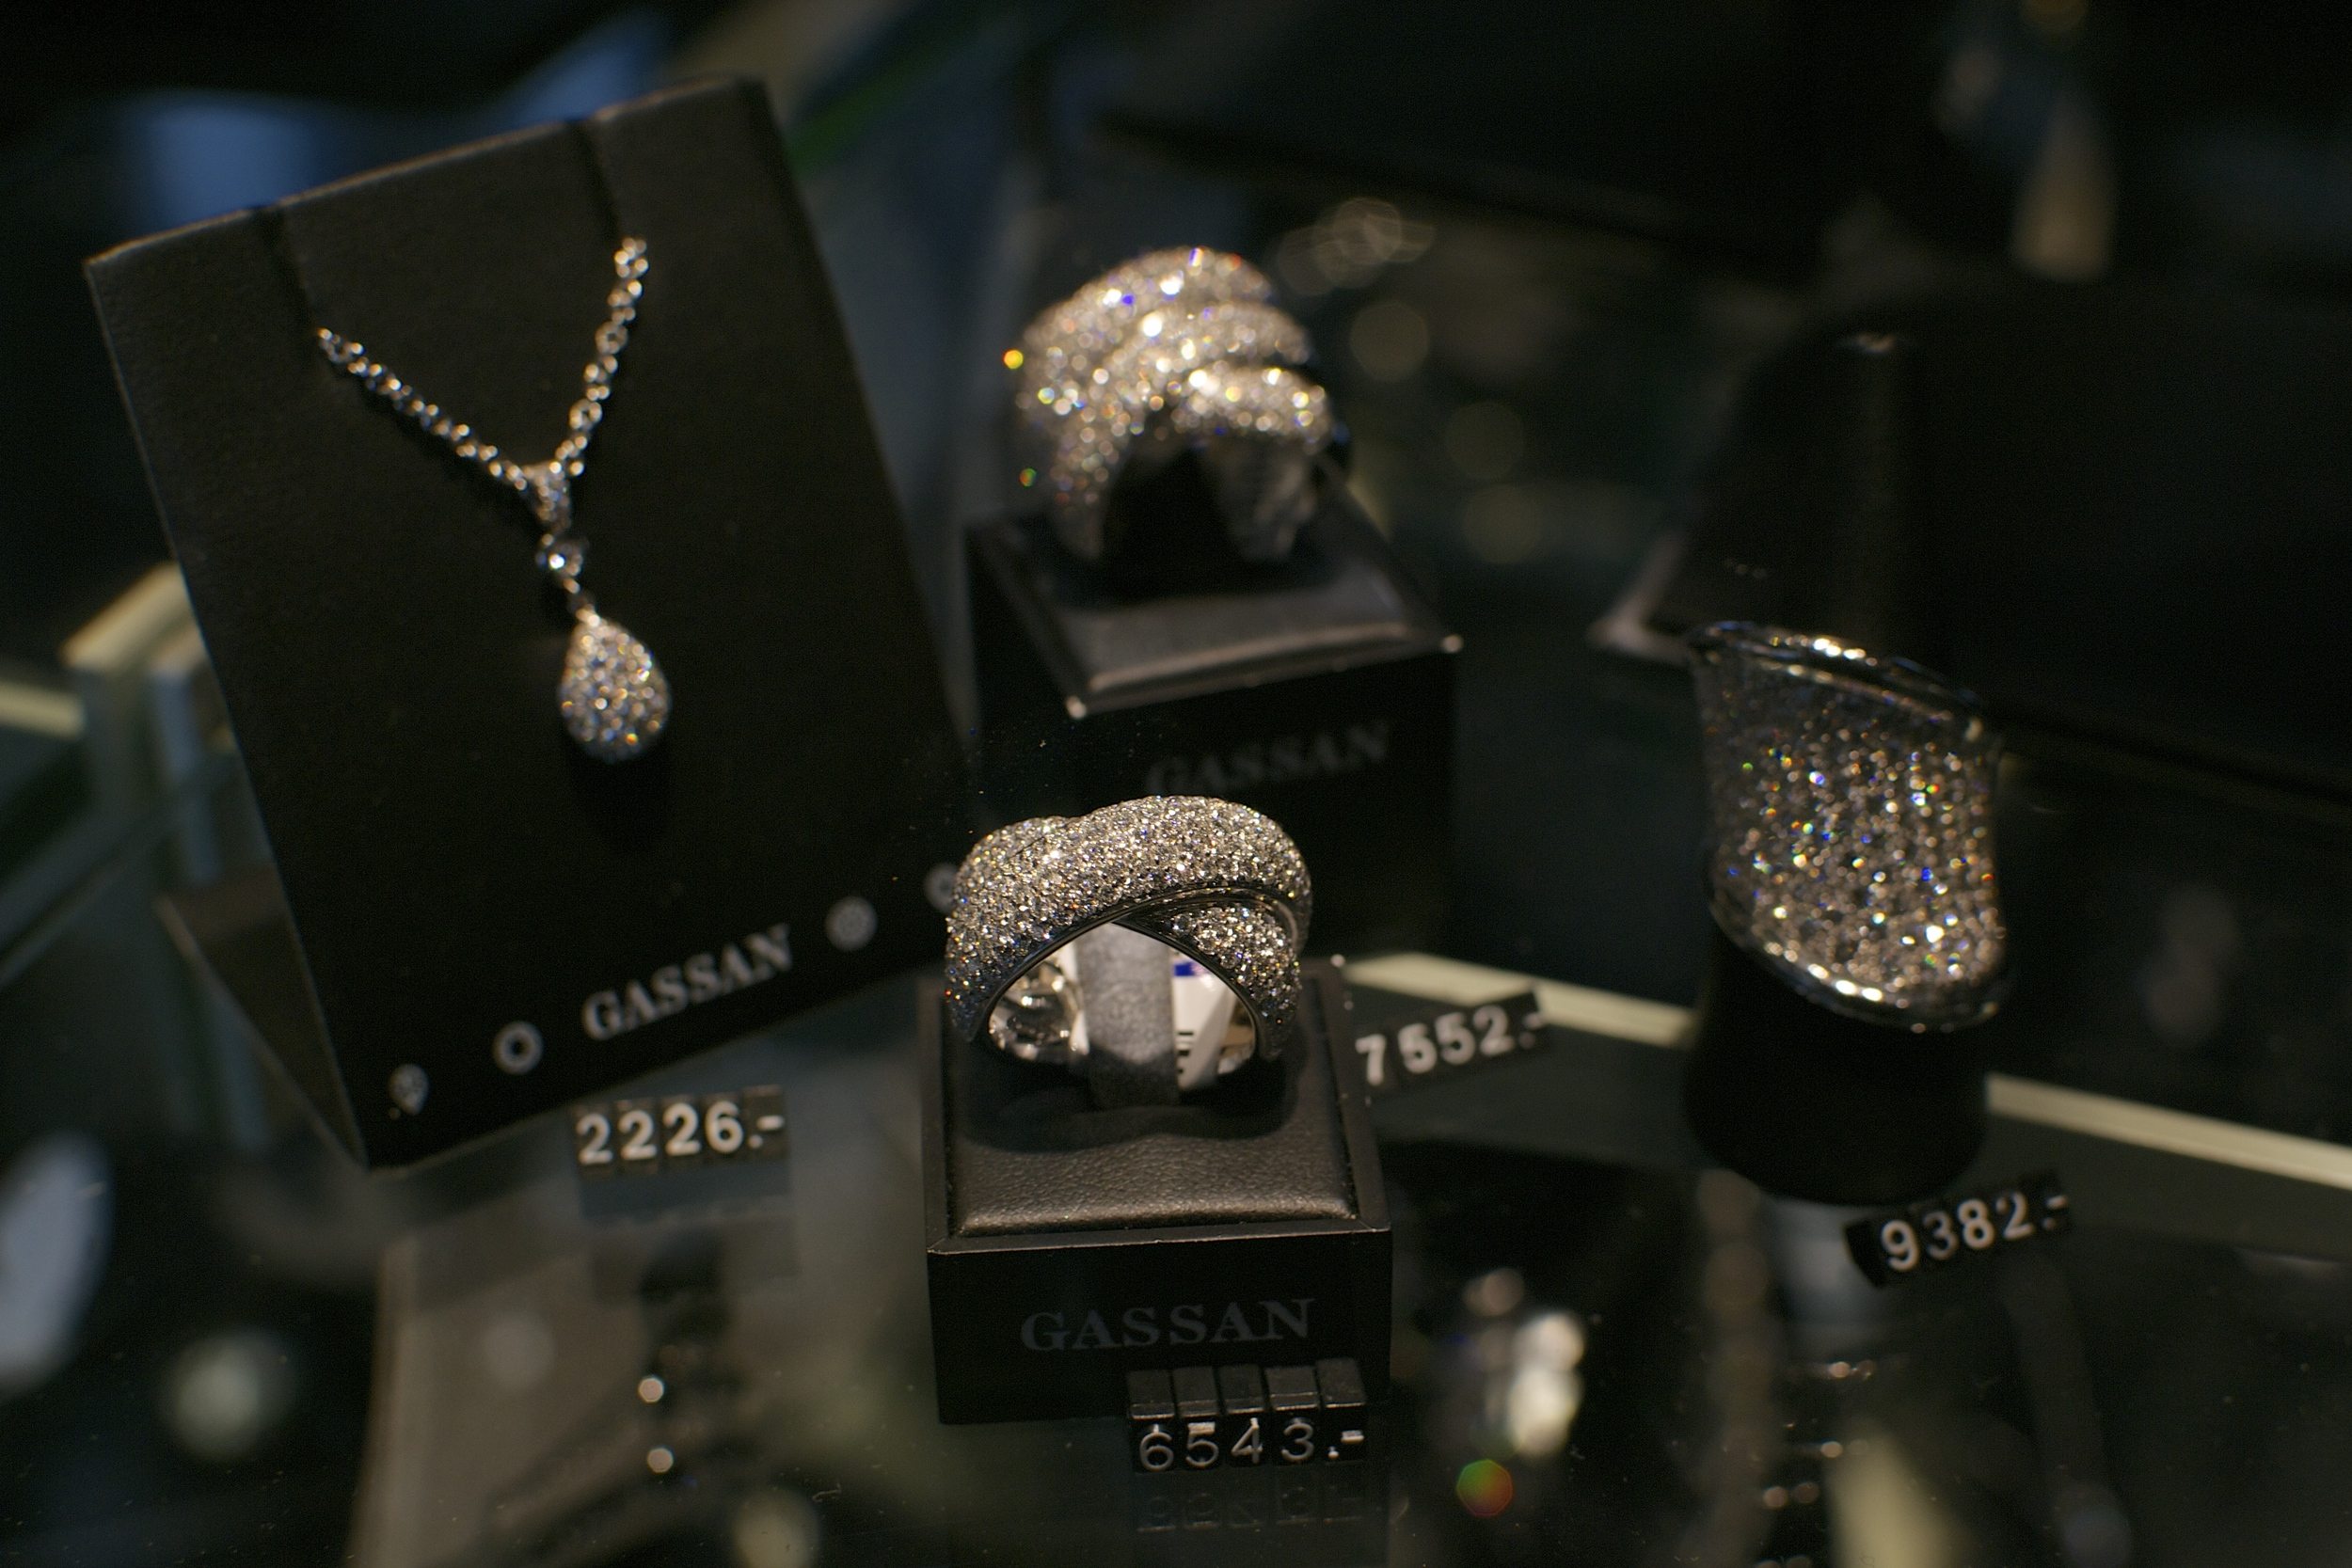 shiny things at gassan diamonds